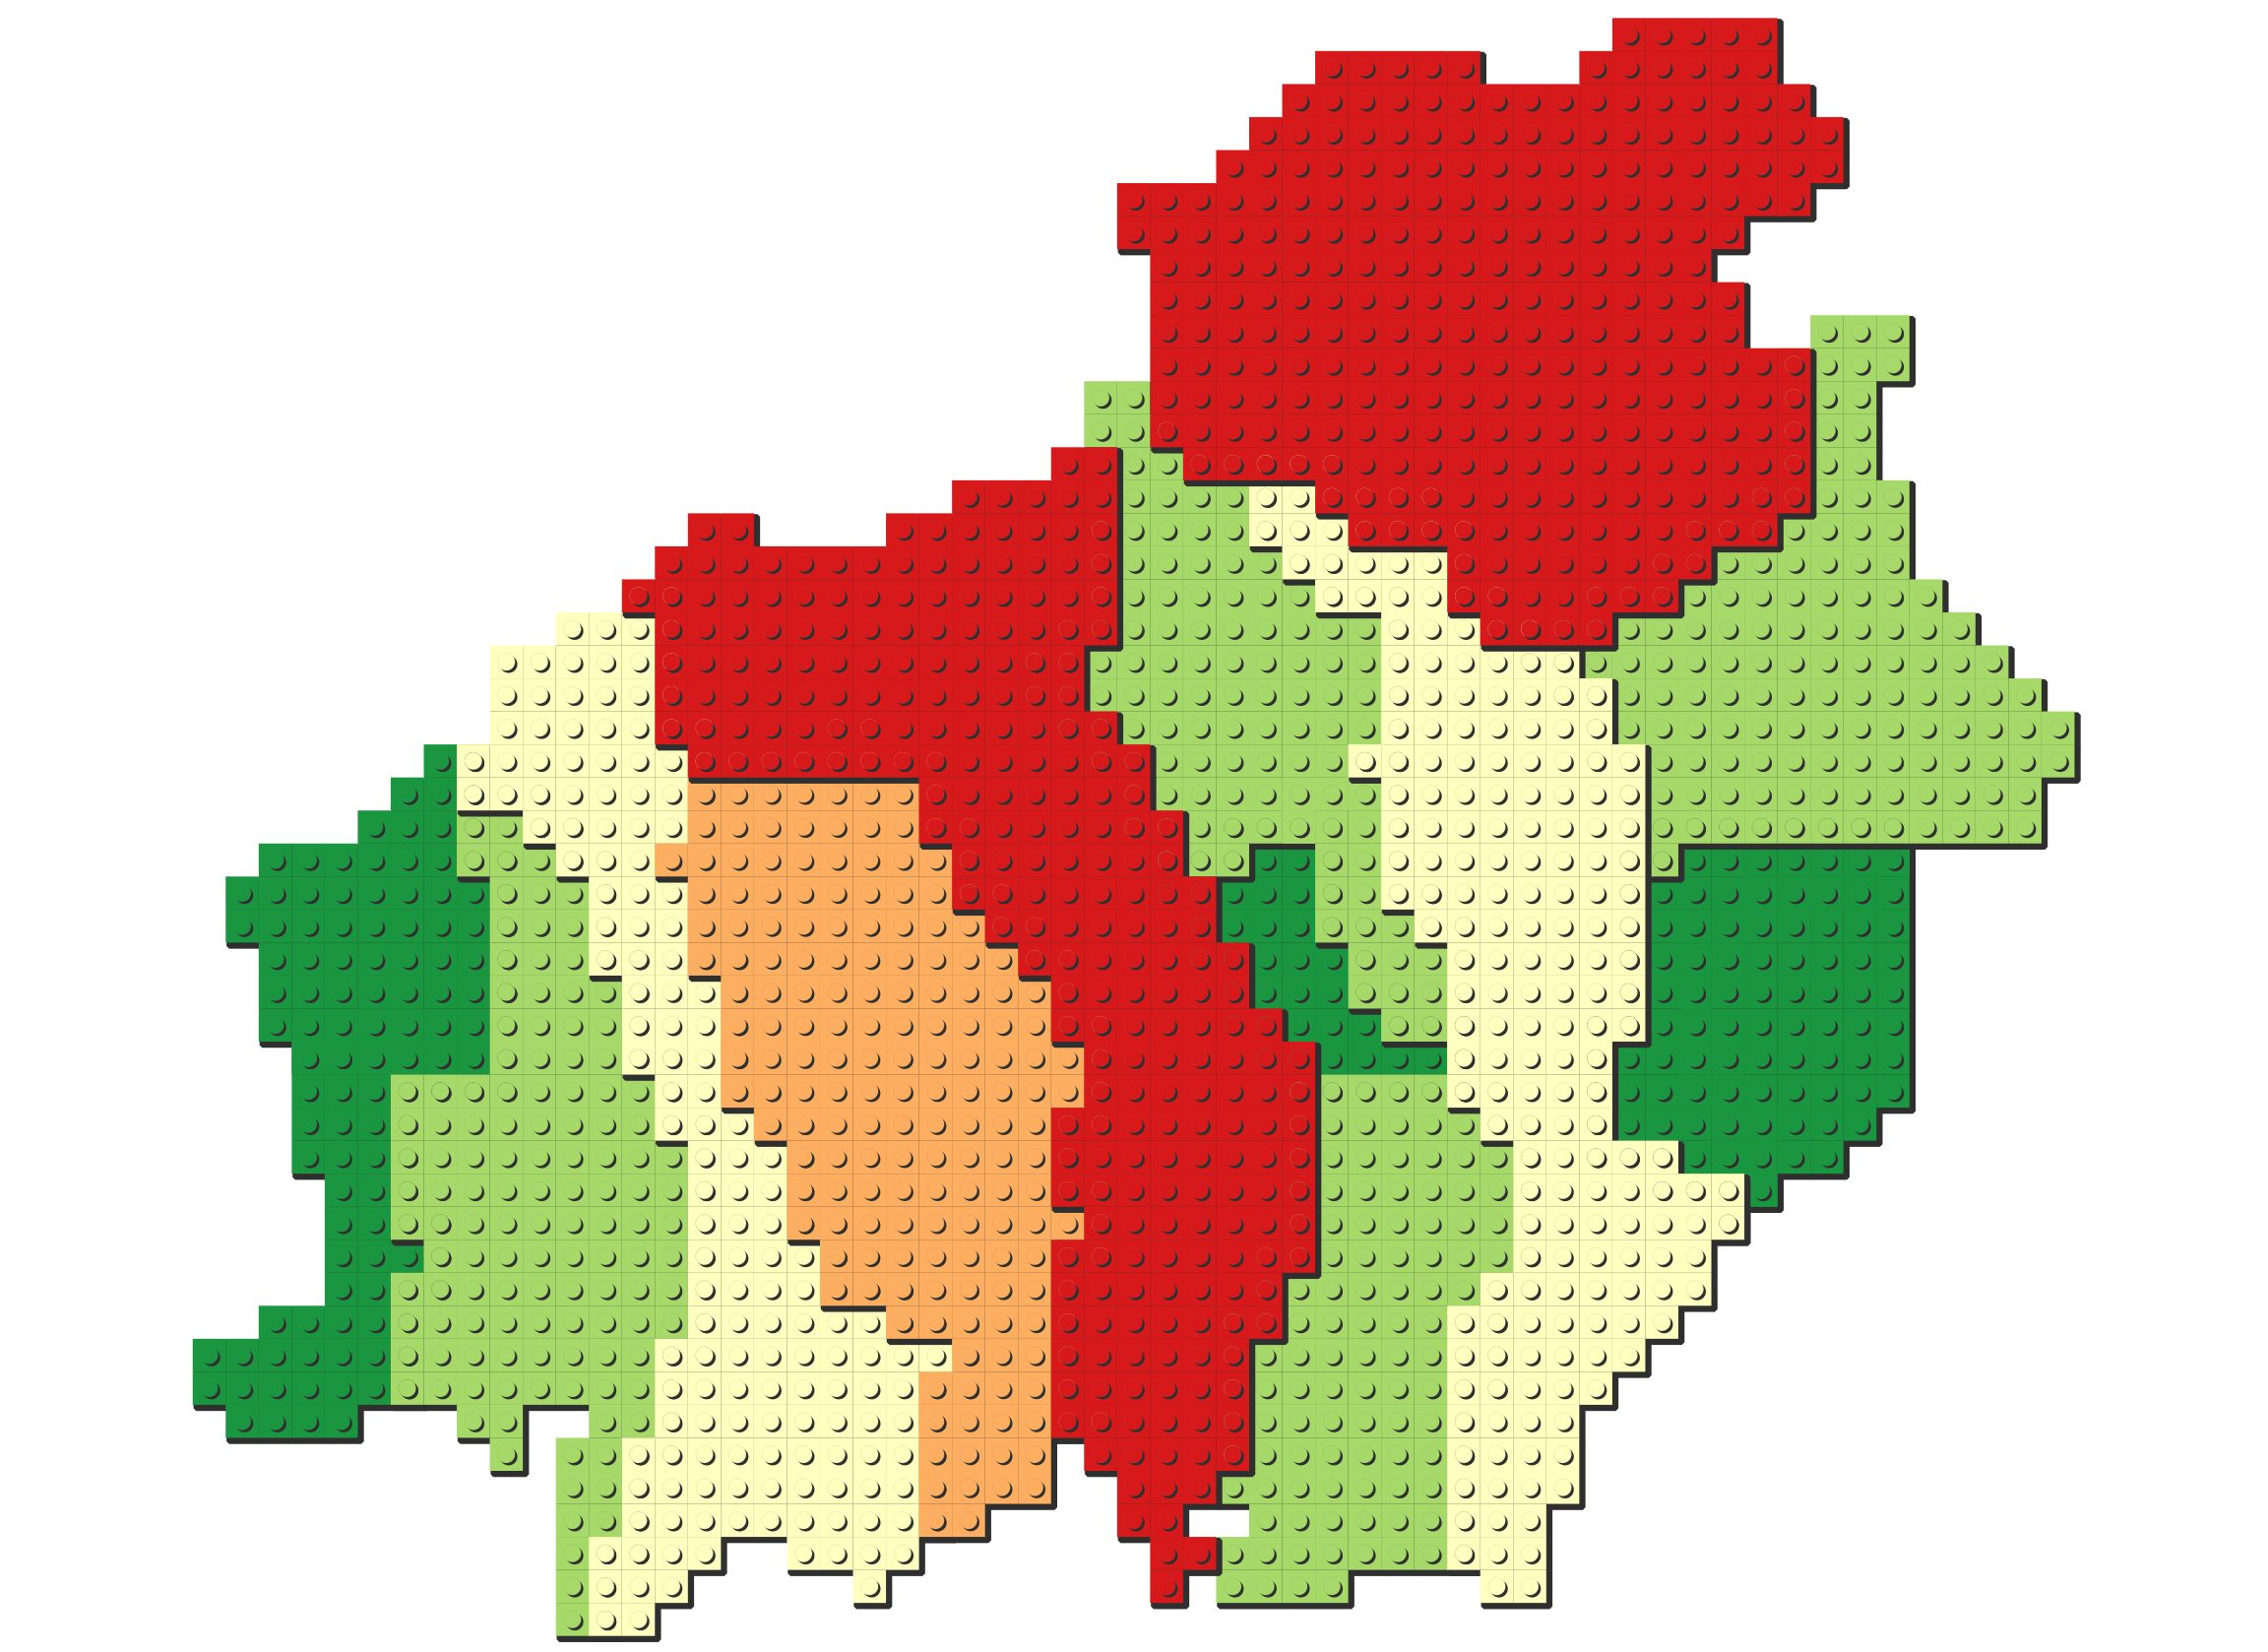 Hasil-Peta-Lego-Lego-Maps-menggunakan-QGIS